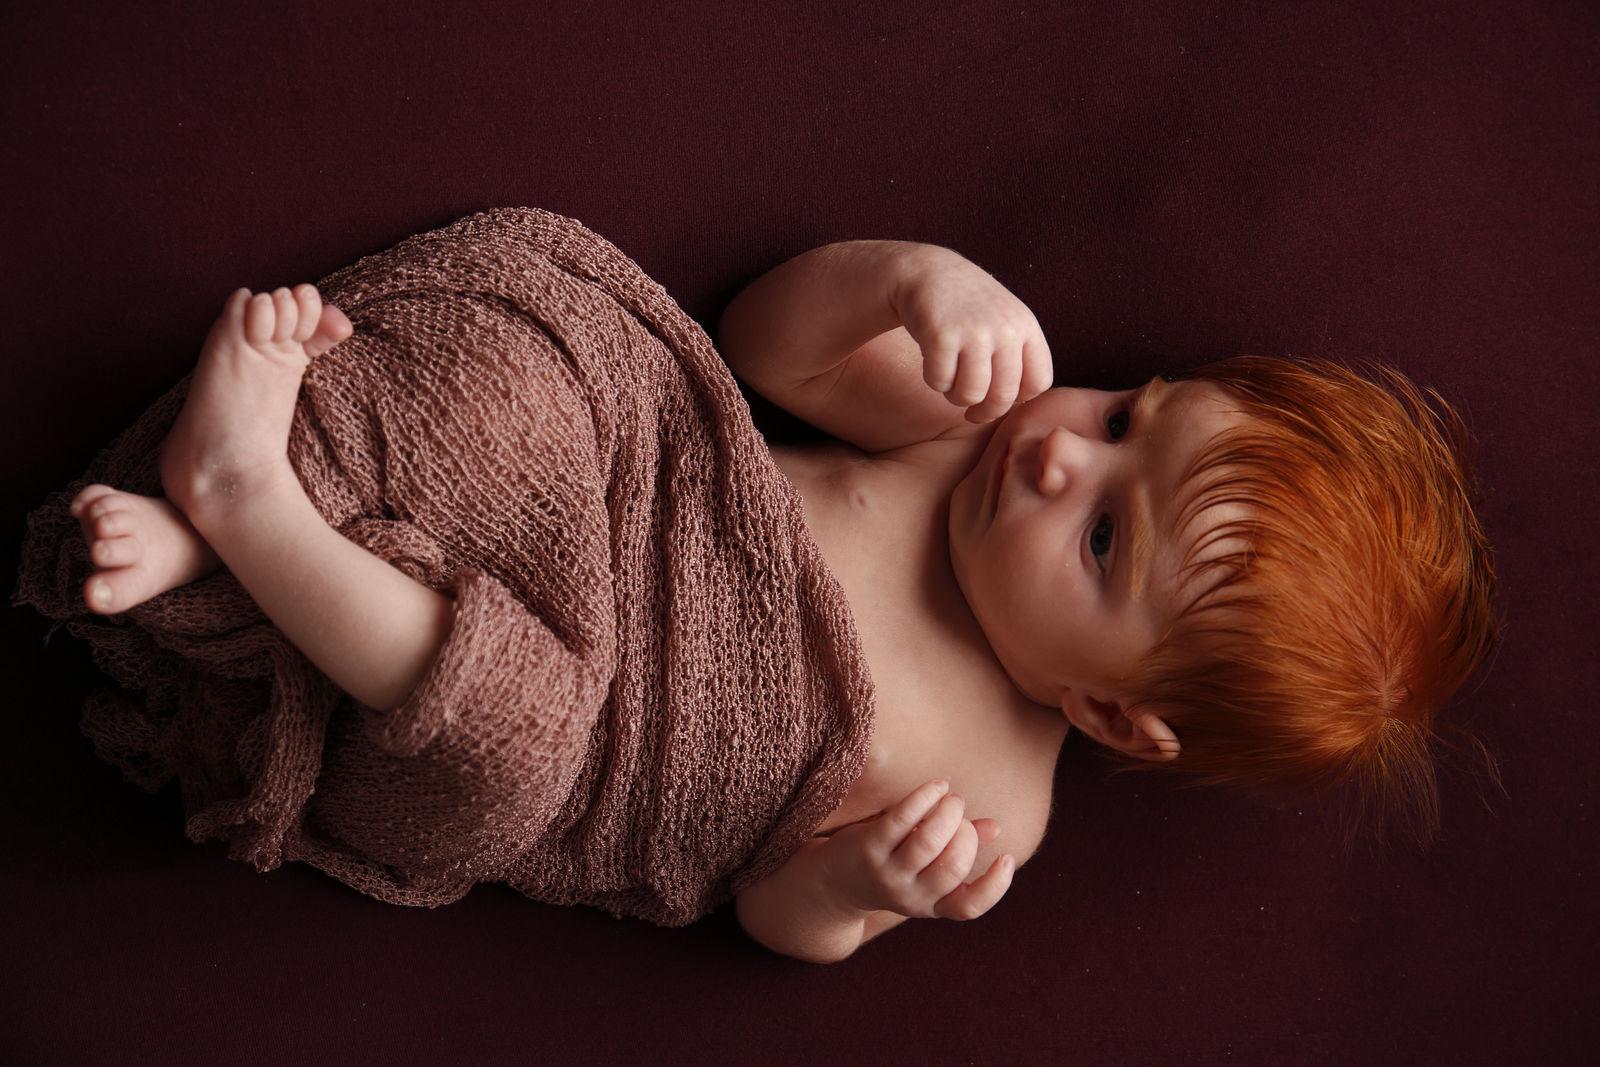 Newborn-Photographers-Manchester-020